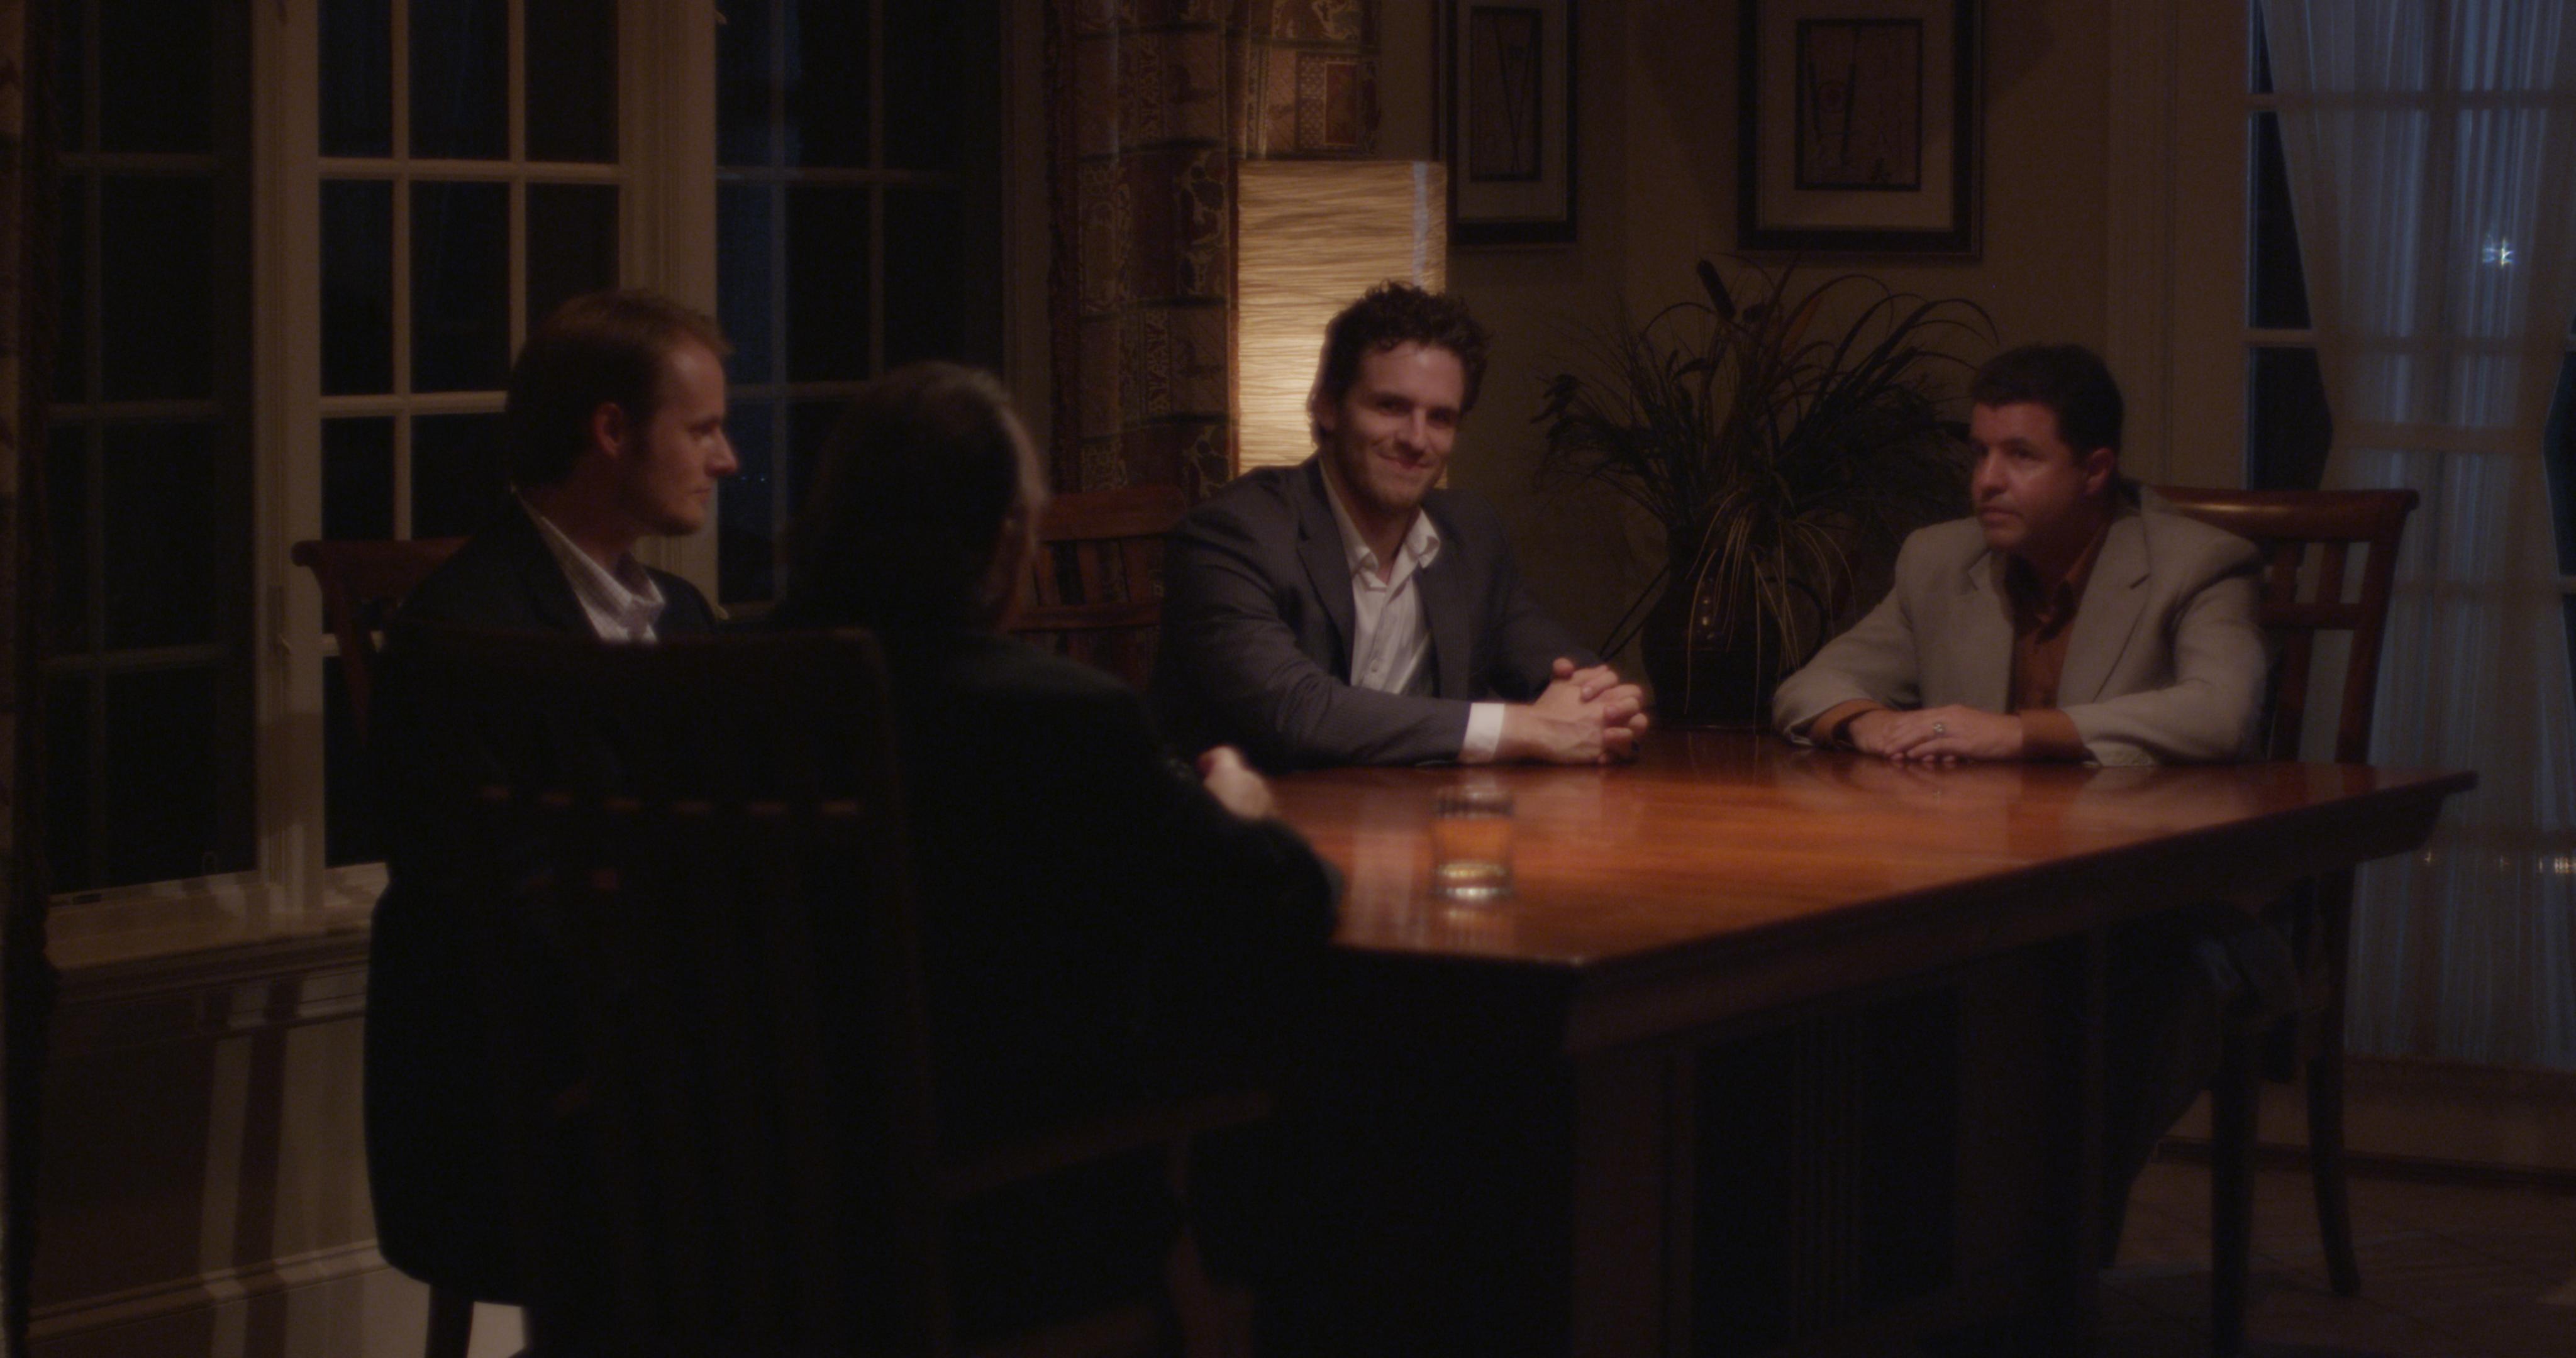 The Avenue - Eddie, Christian, Gordon, and Nicholas around tbale